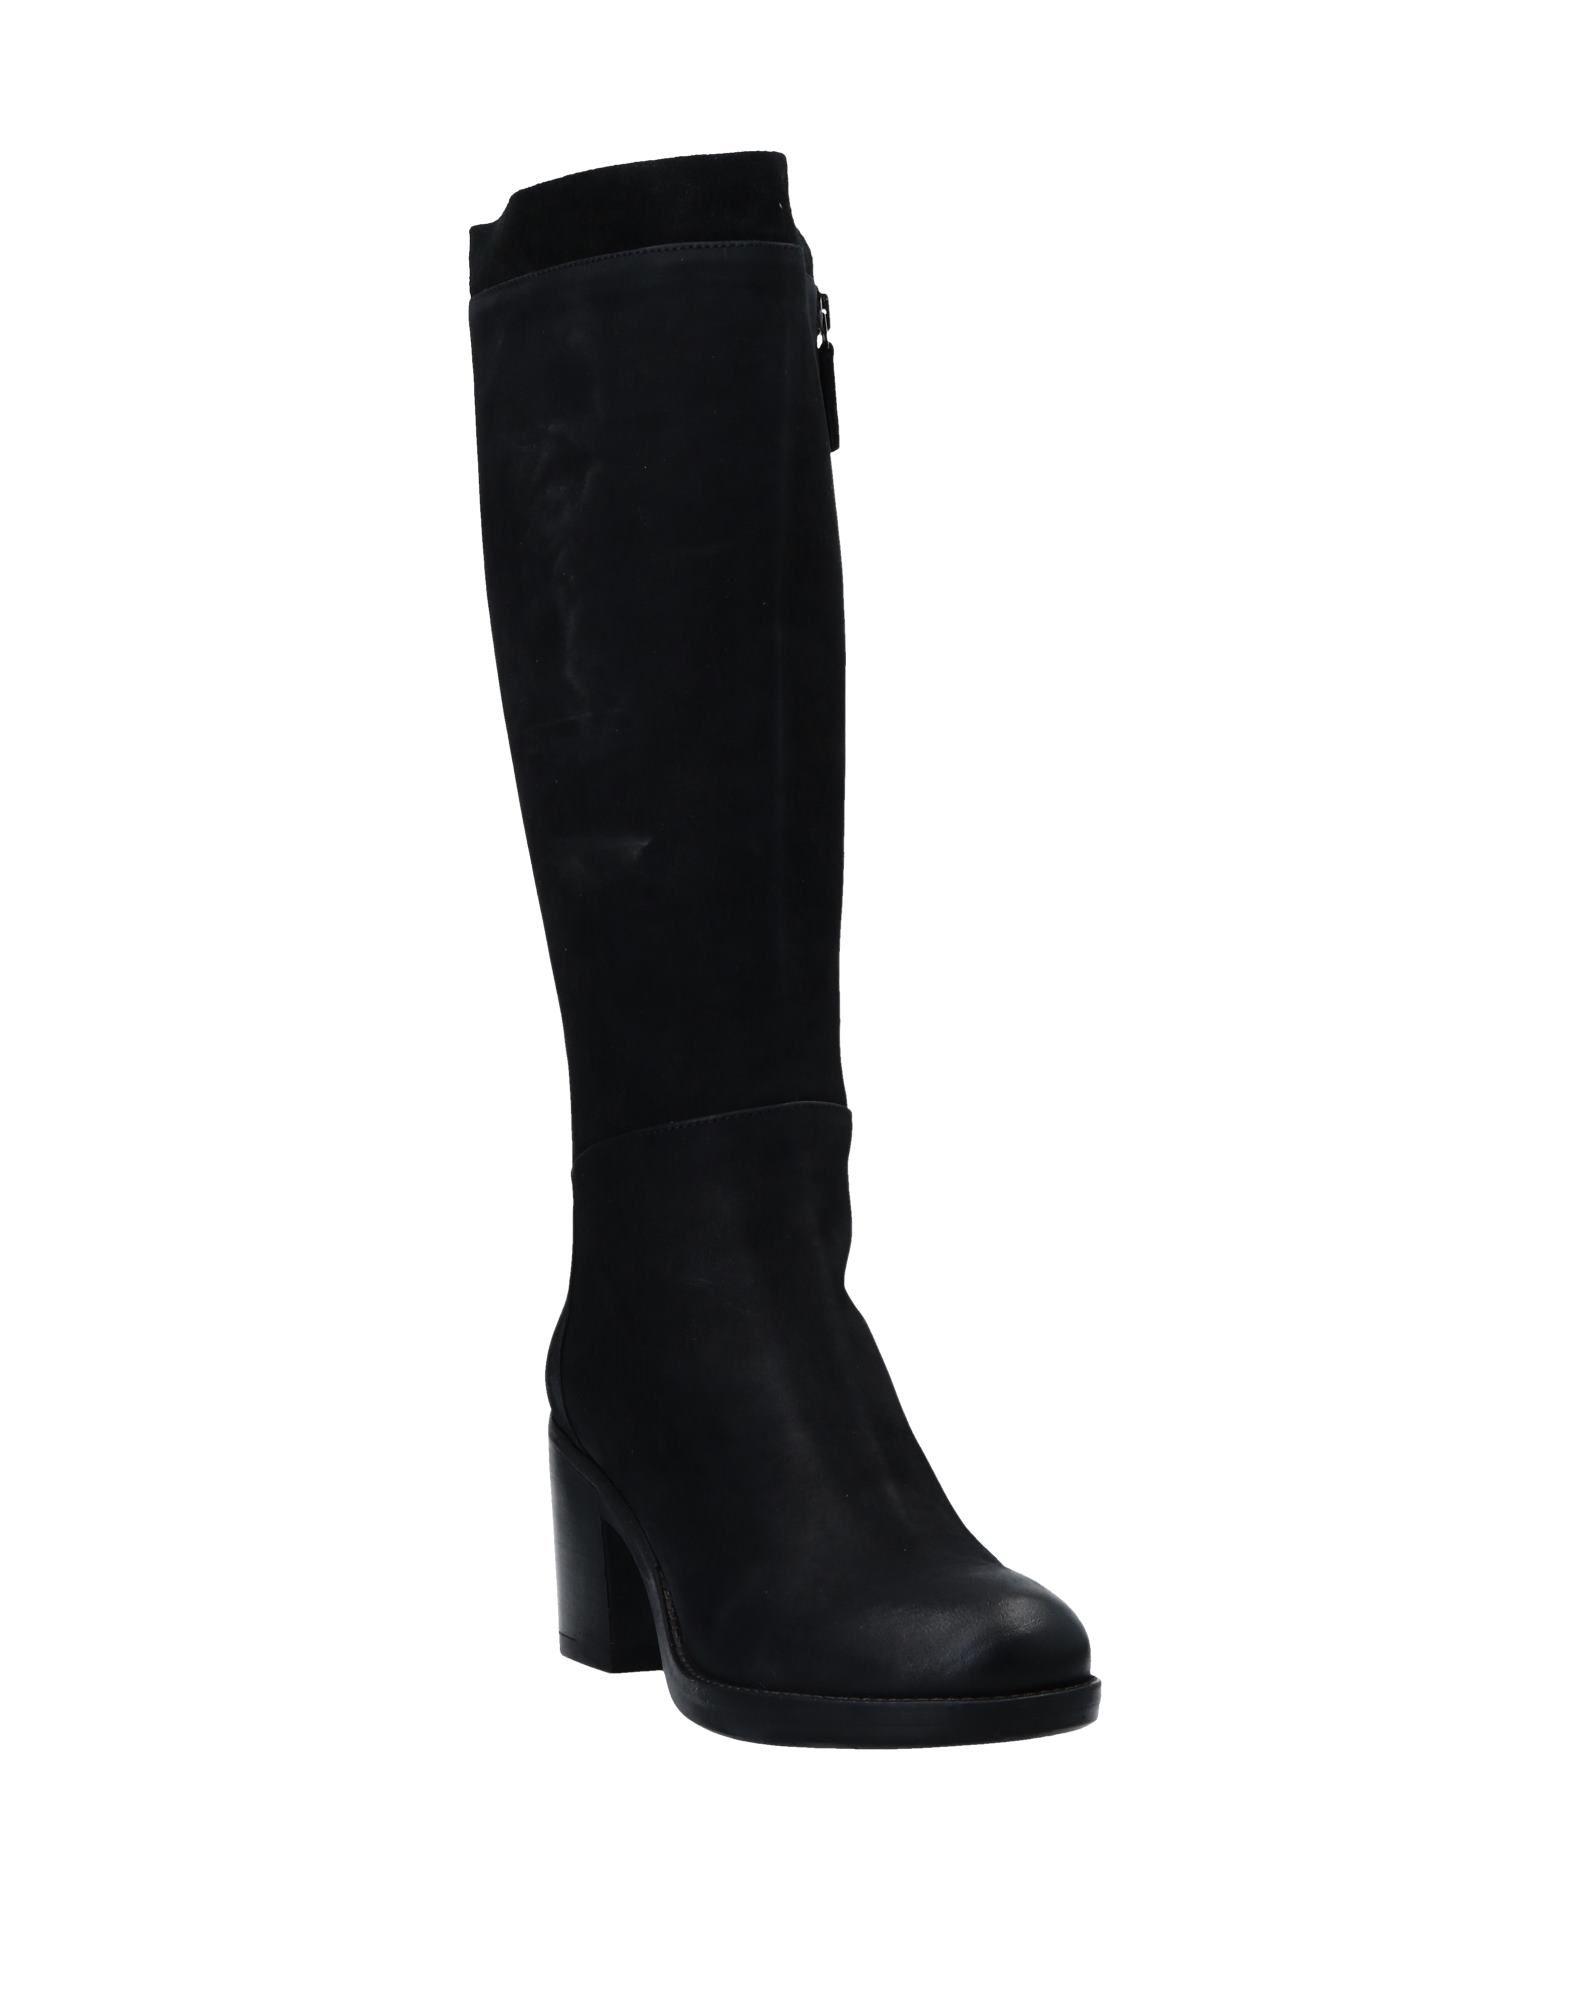 Hundred 11552874SLGut 100 Stiefel Damen  11552874SLGut Hundred aussehende strapazierfähige Schuhe 84818a